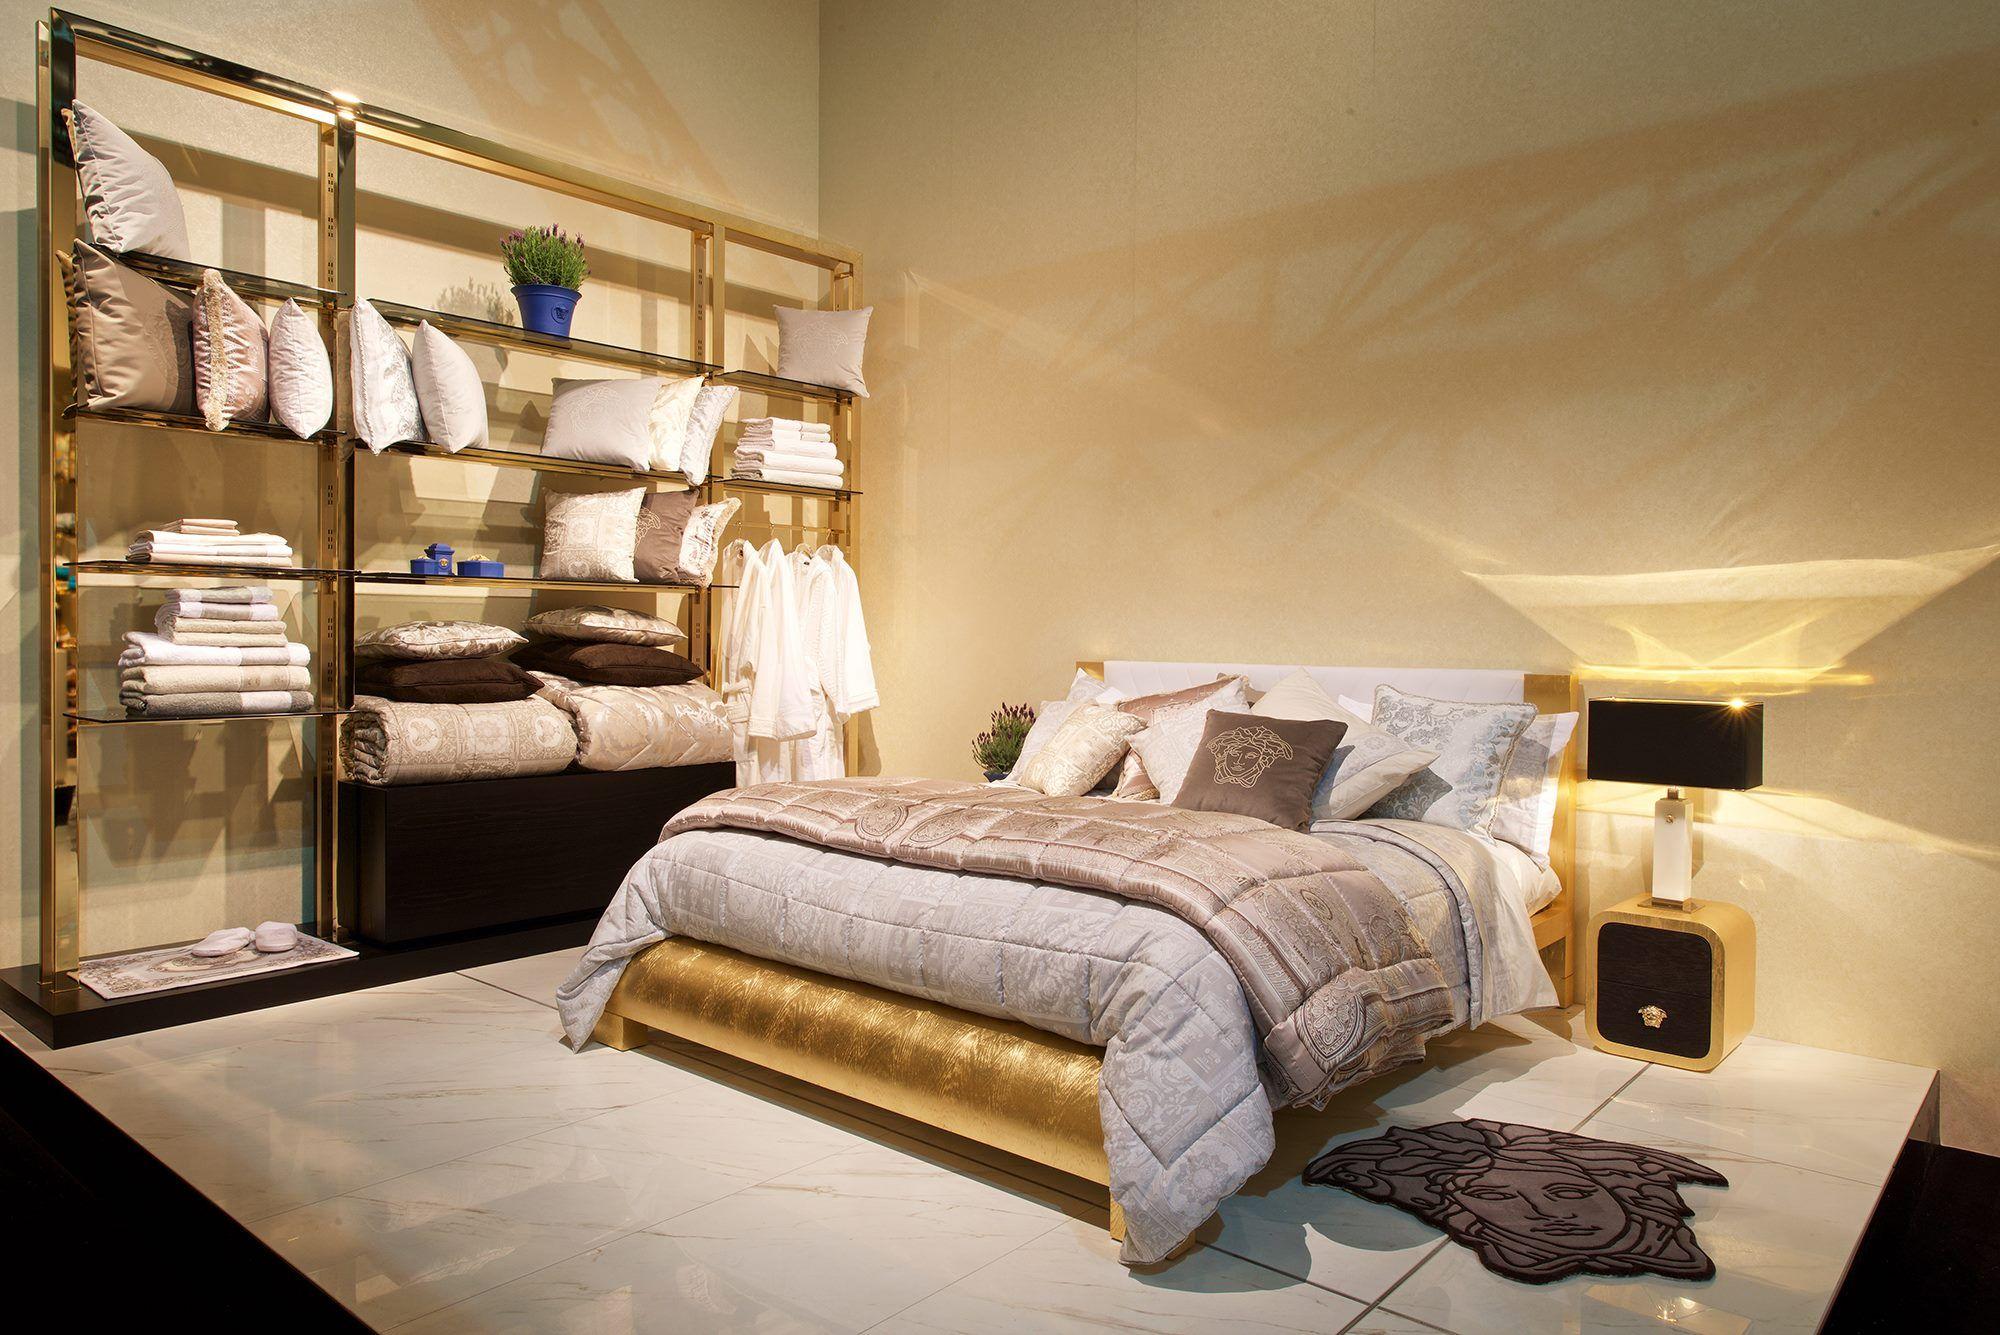 Versace Home Miami Bedrooms  Luxury interior, Versace home, Home